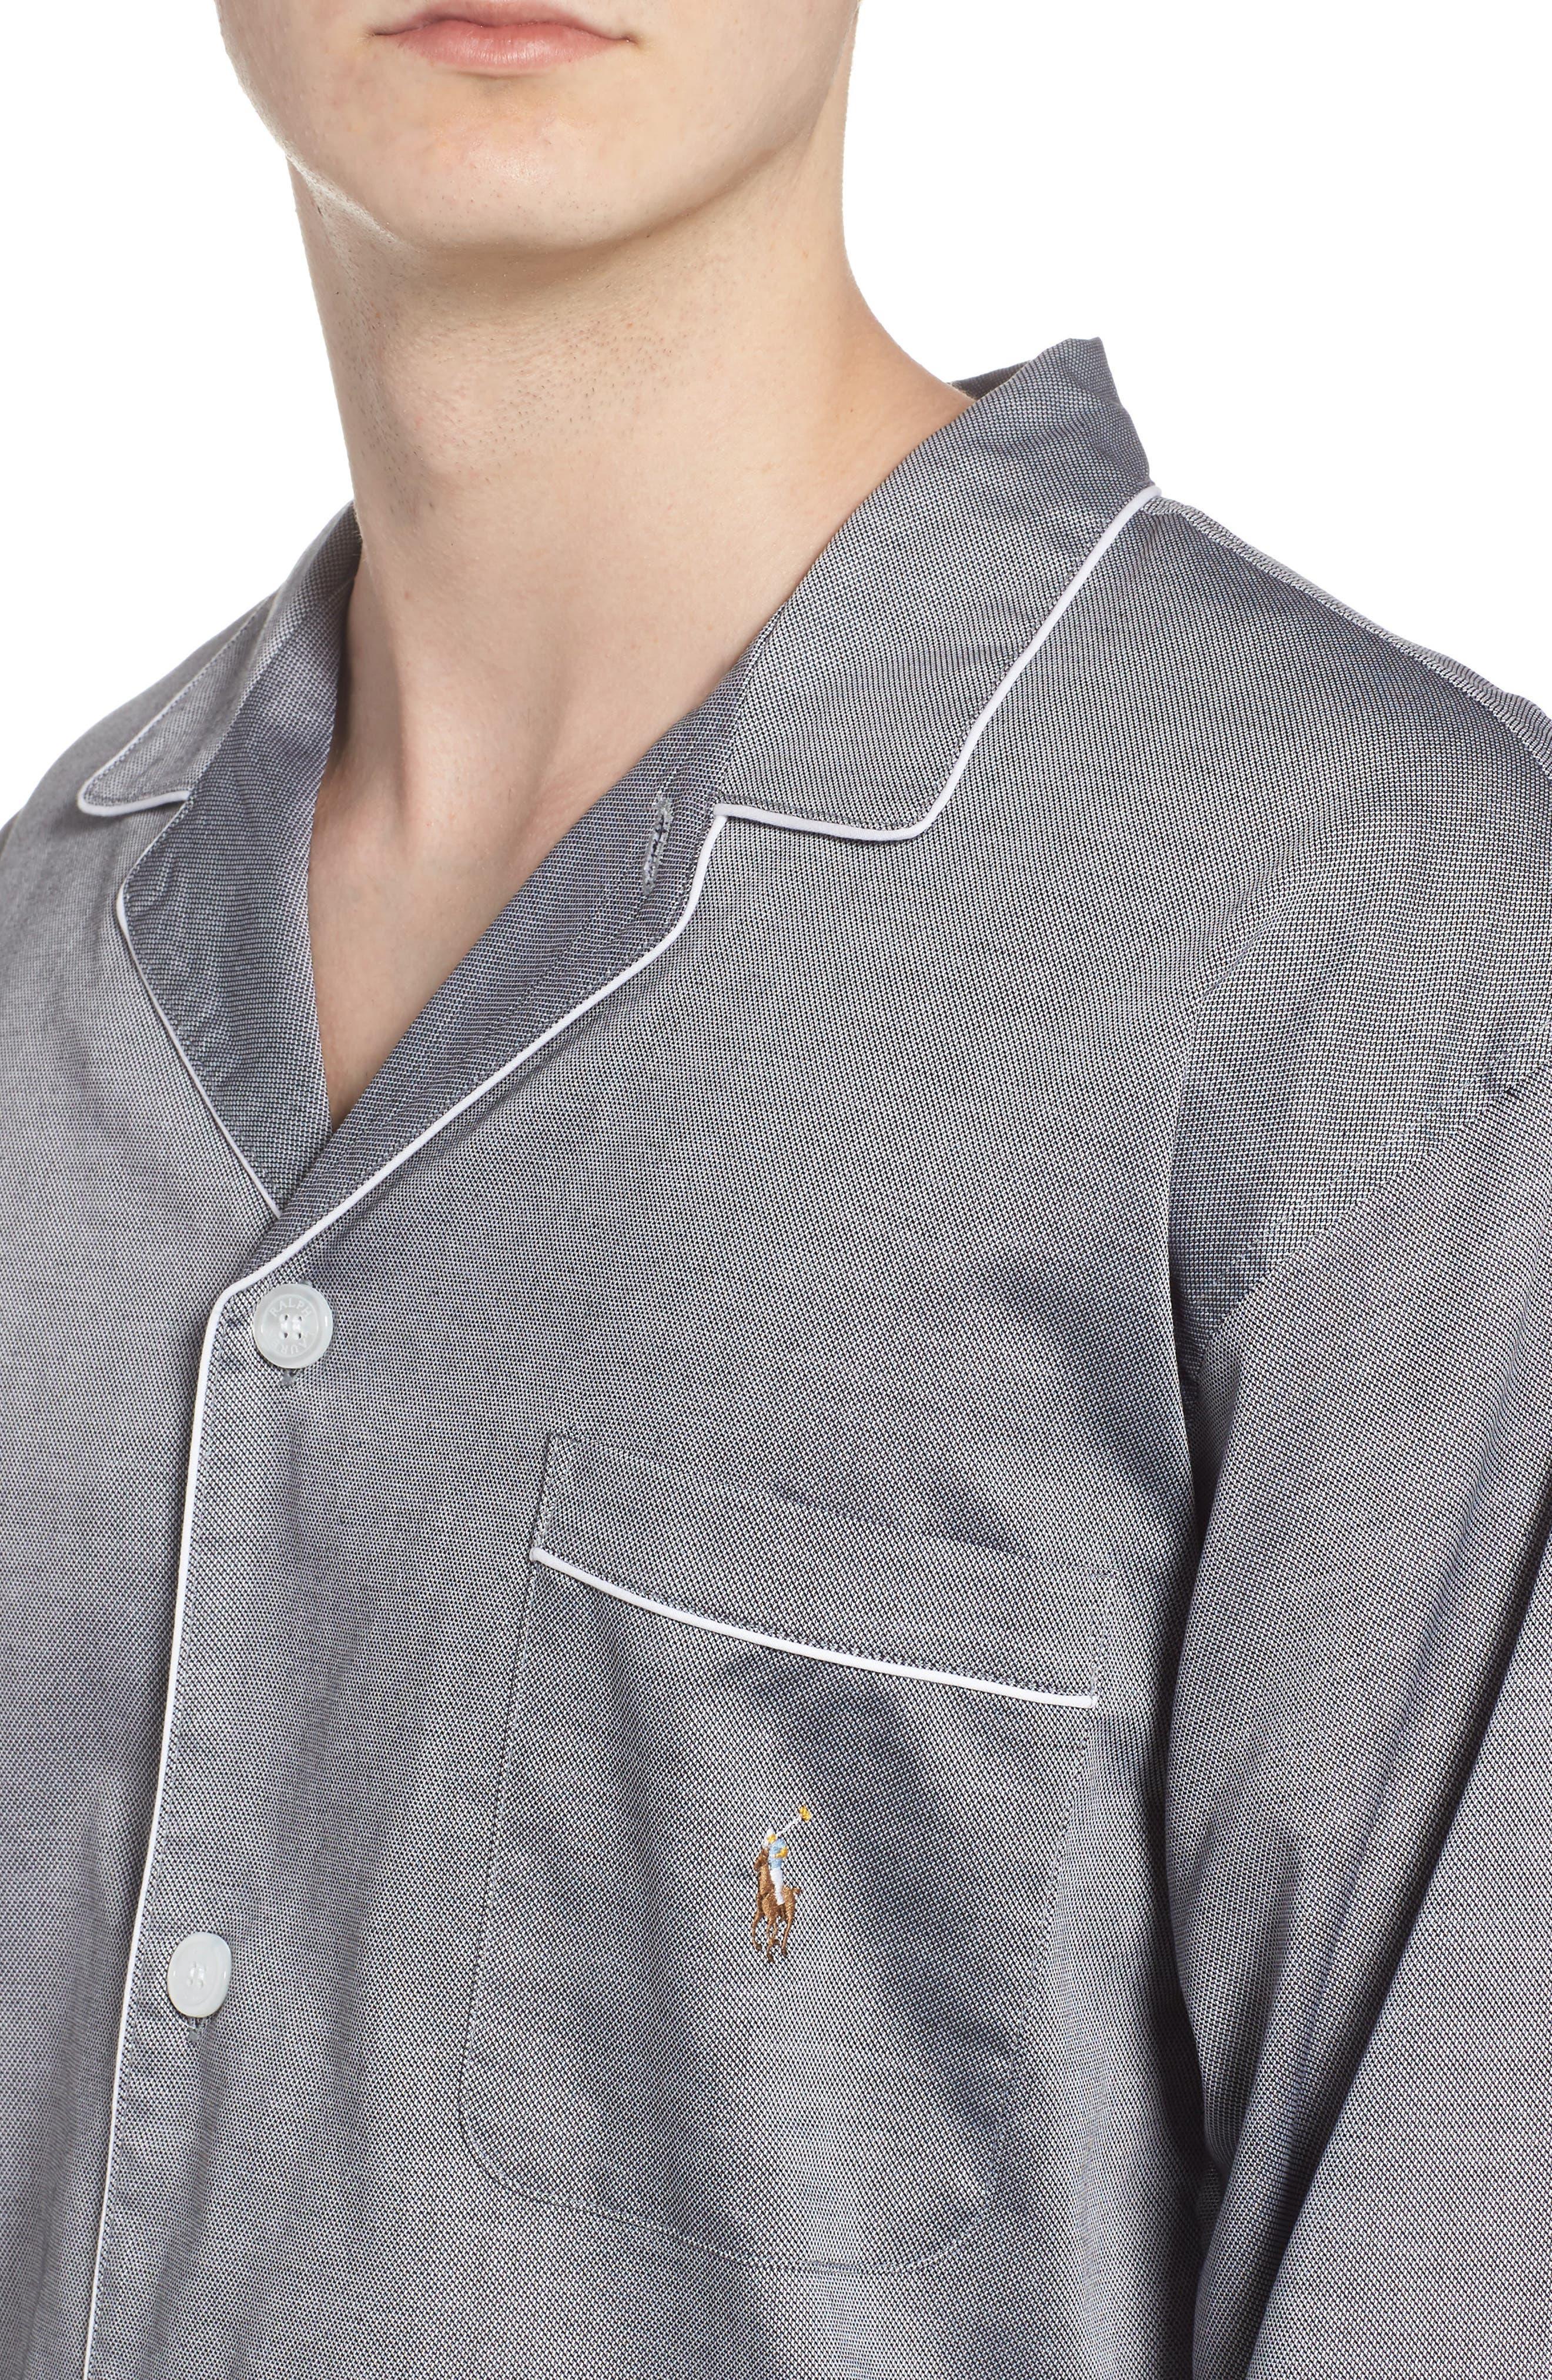 Pajama Top,                             Alternate thumbnail 5, color,                             BLACK ROYAL OXFORD